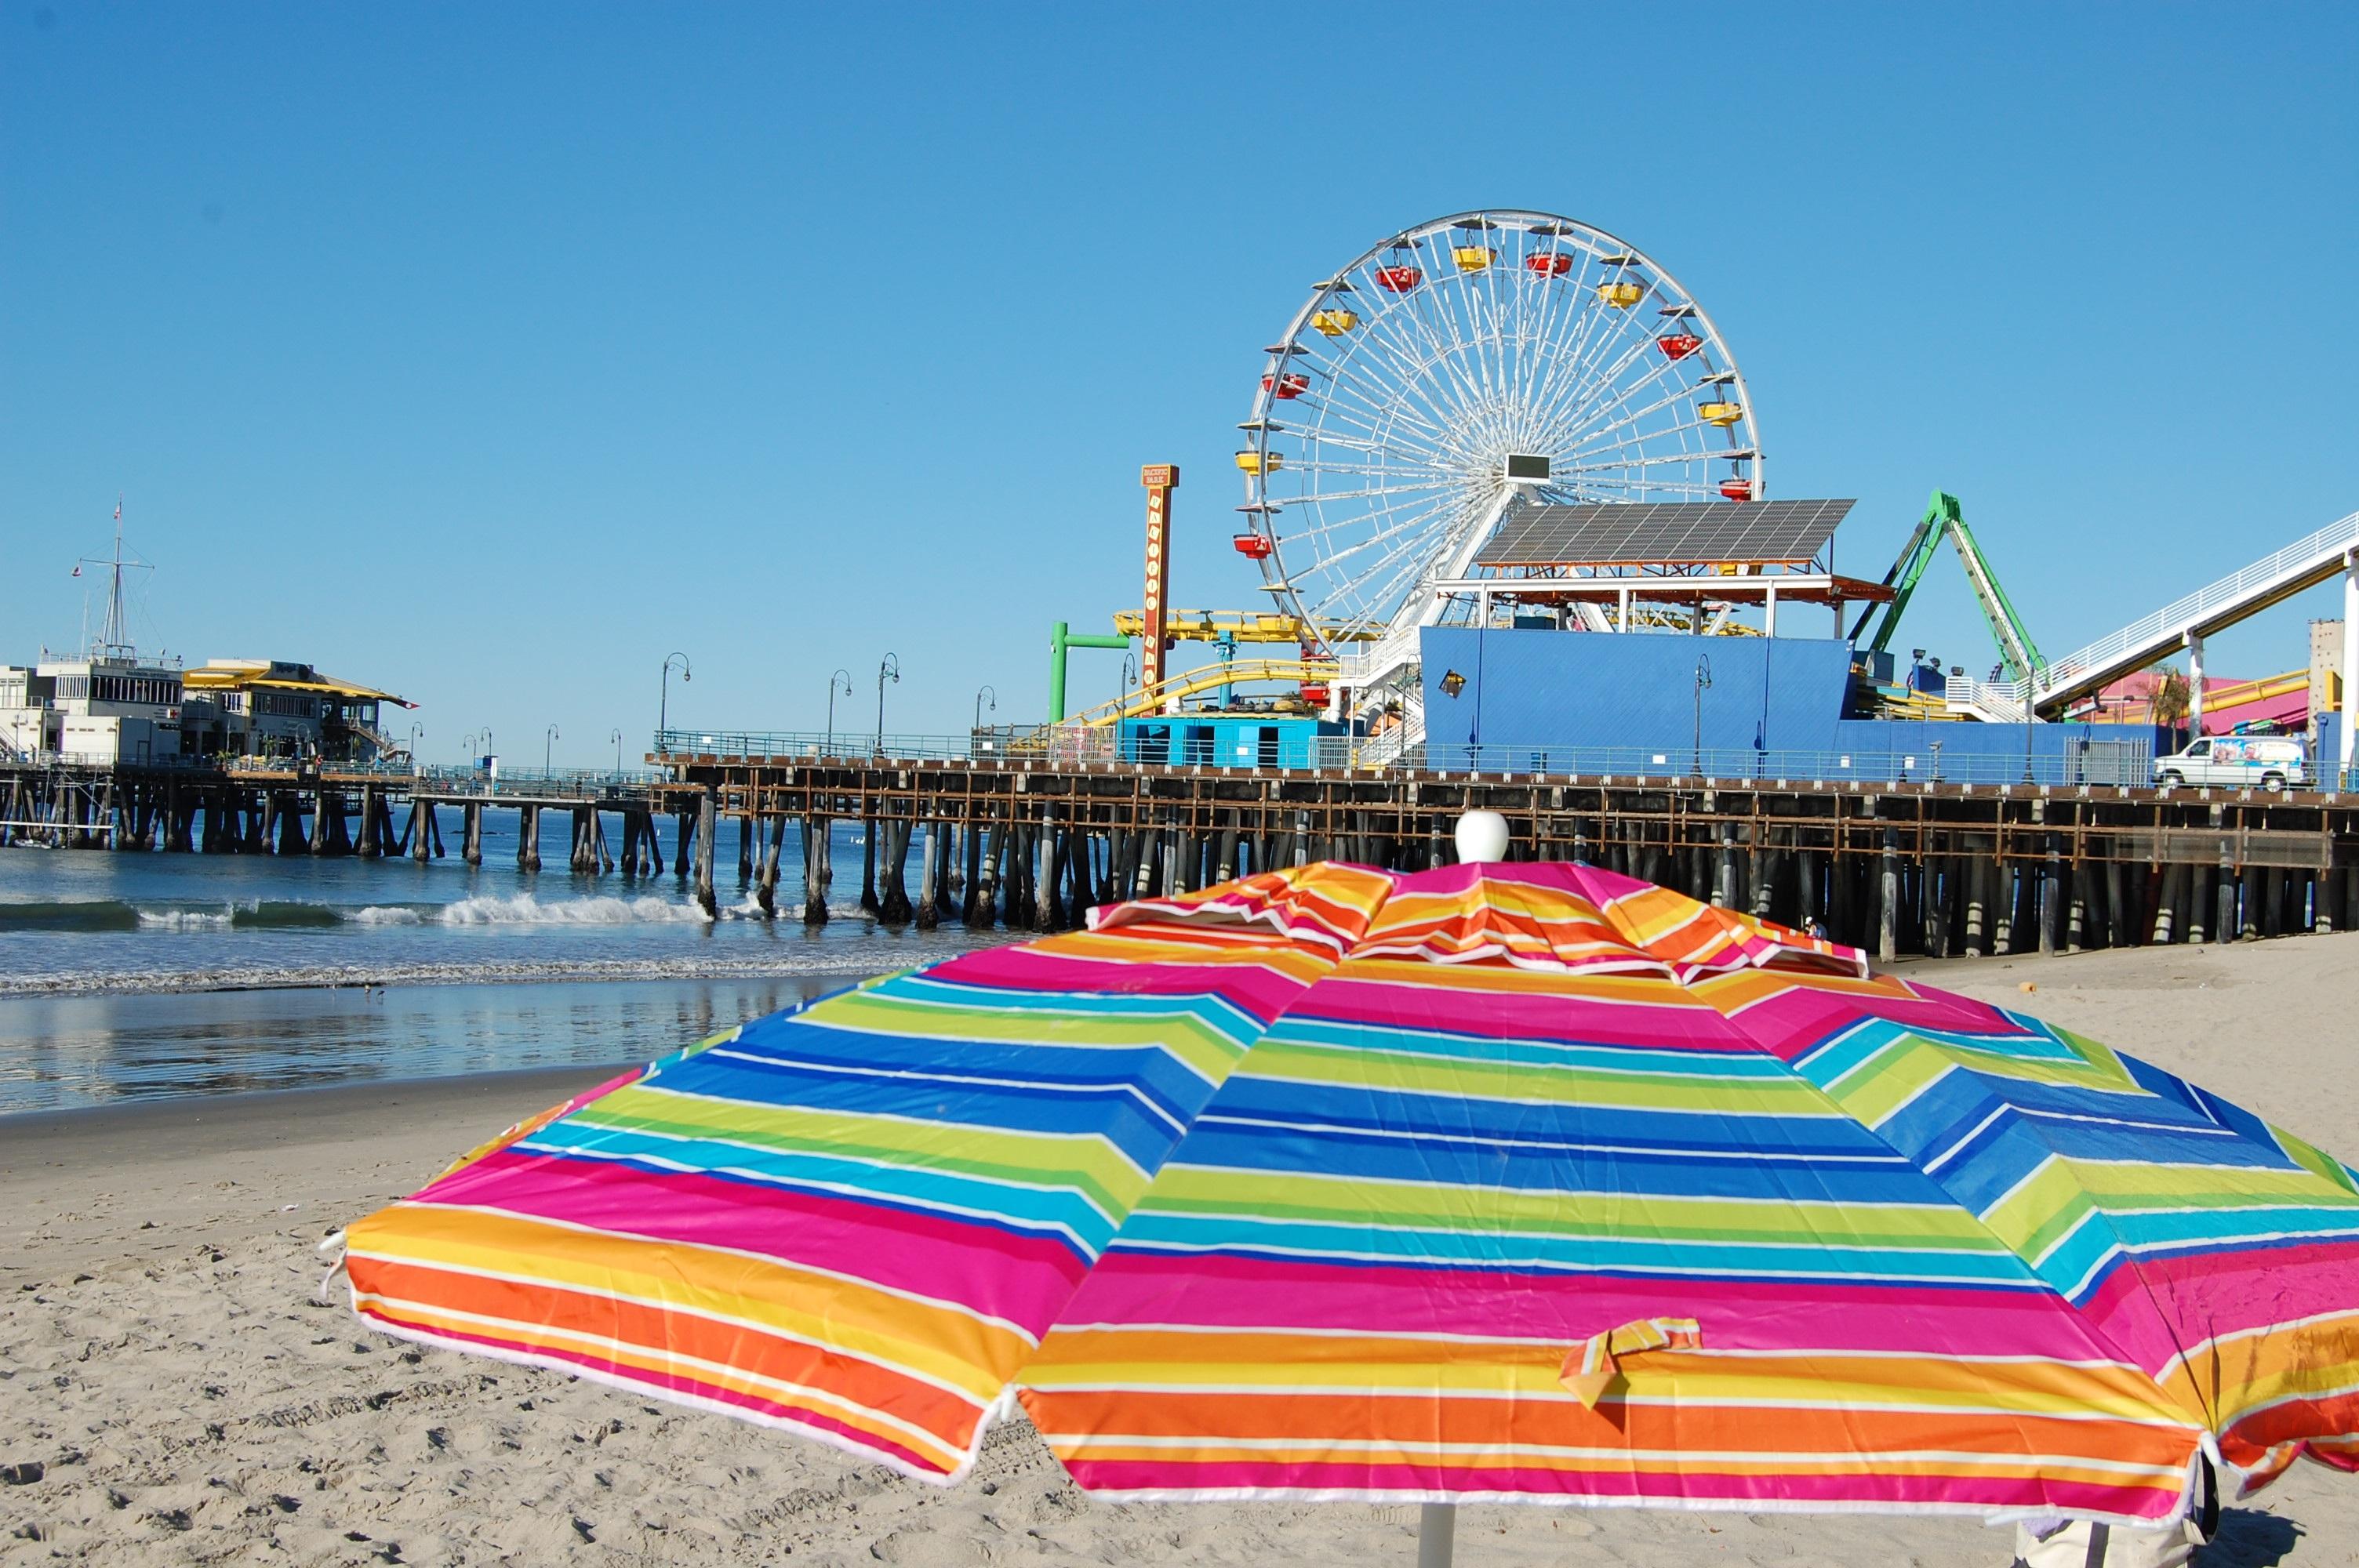 Beach Sea Coast Water Sand Ocean Sky Wheel Pier Summer Vacation Travel Relax Amut Park Umbrella